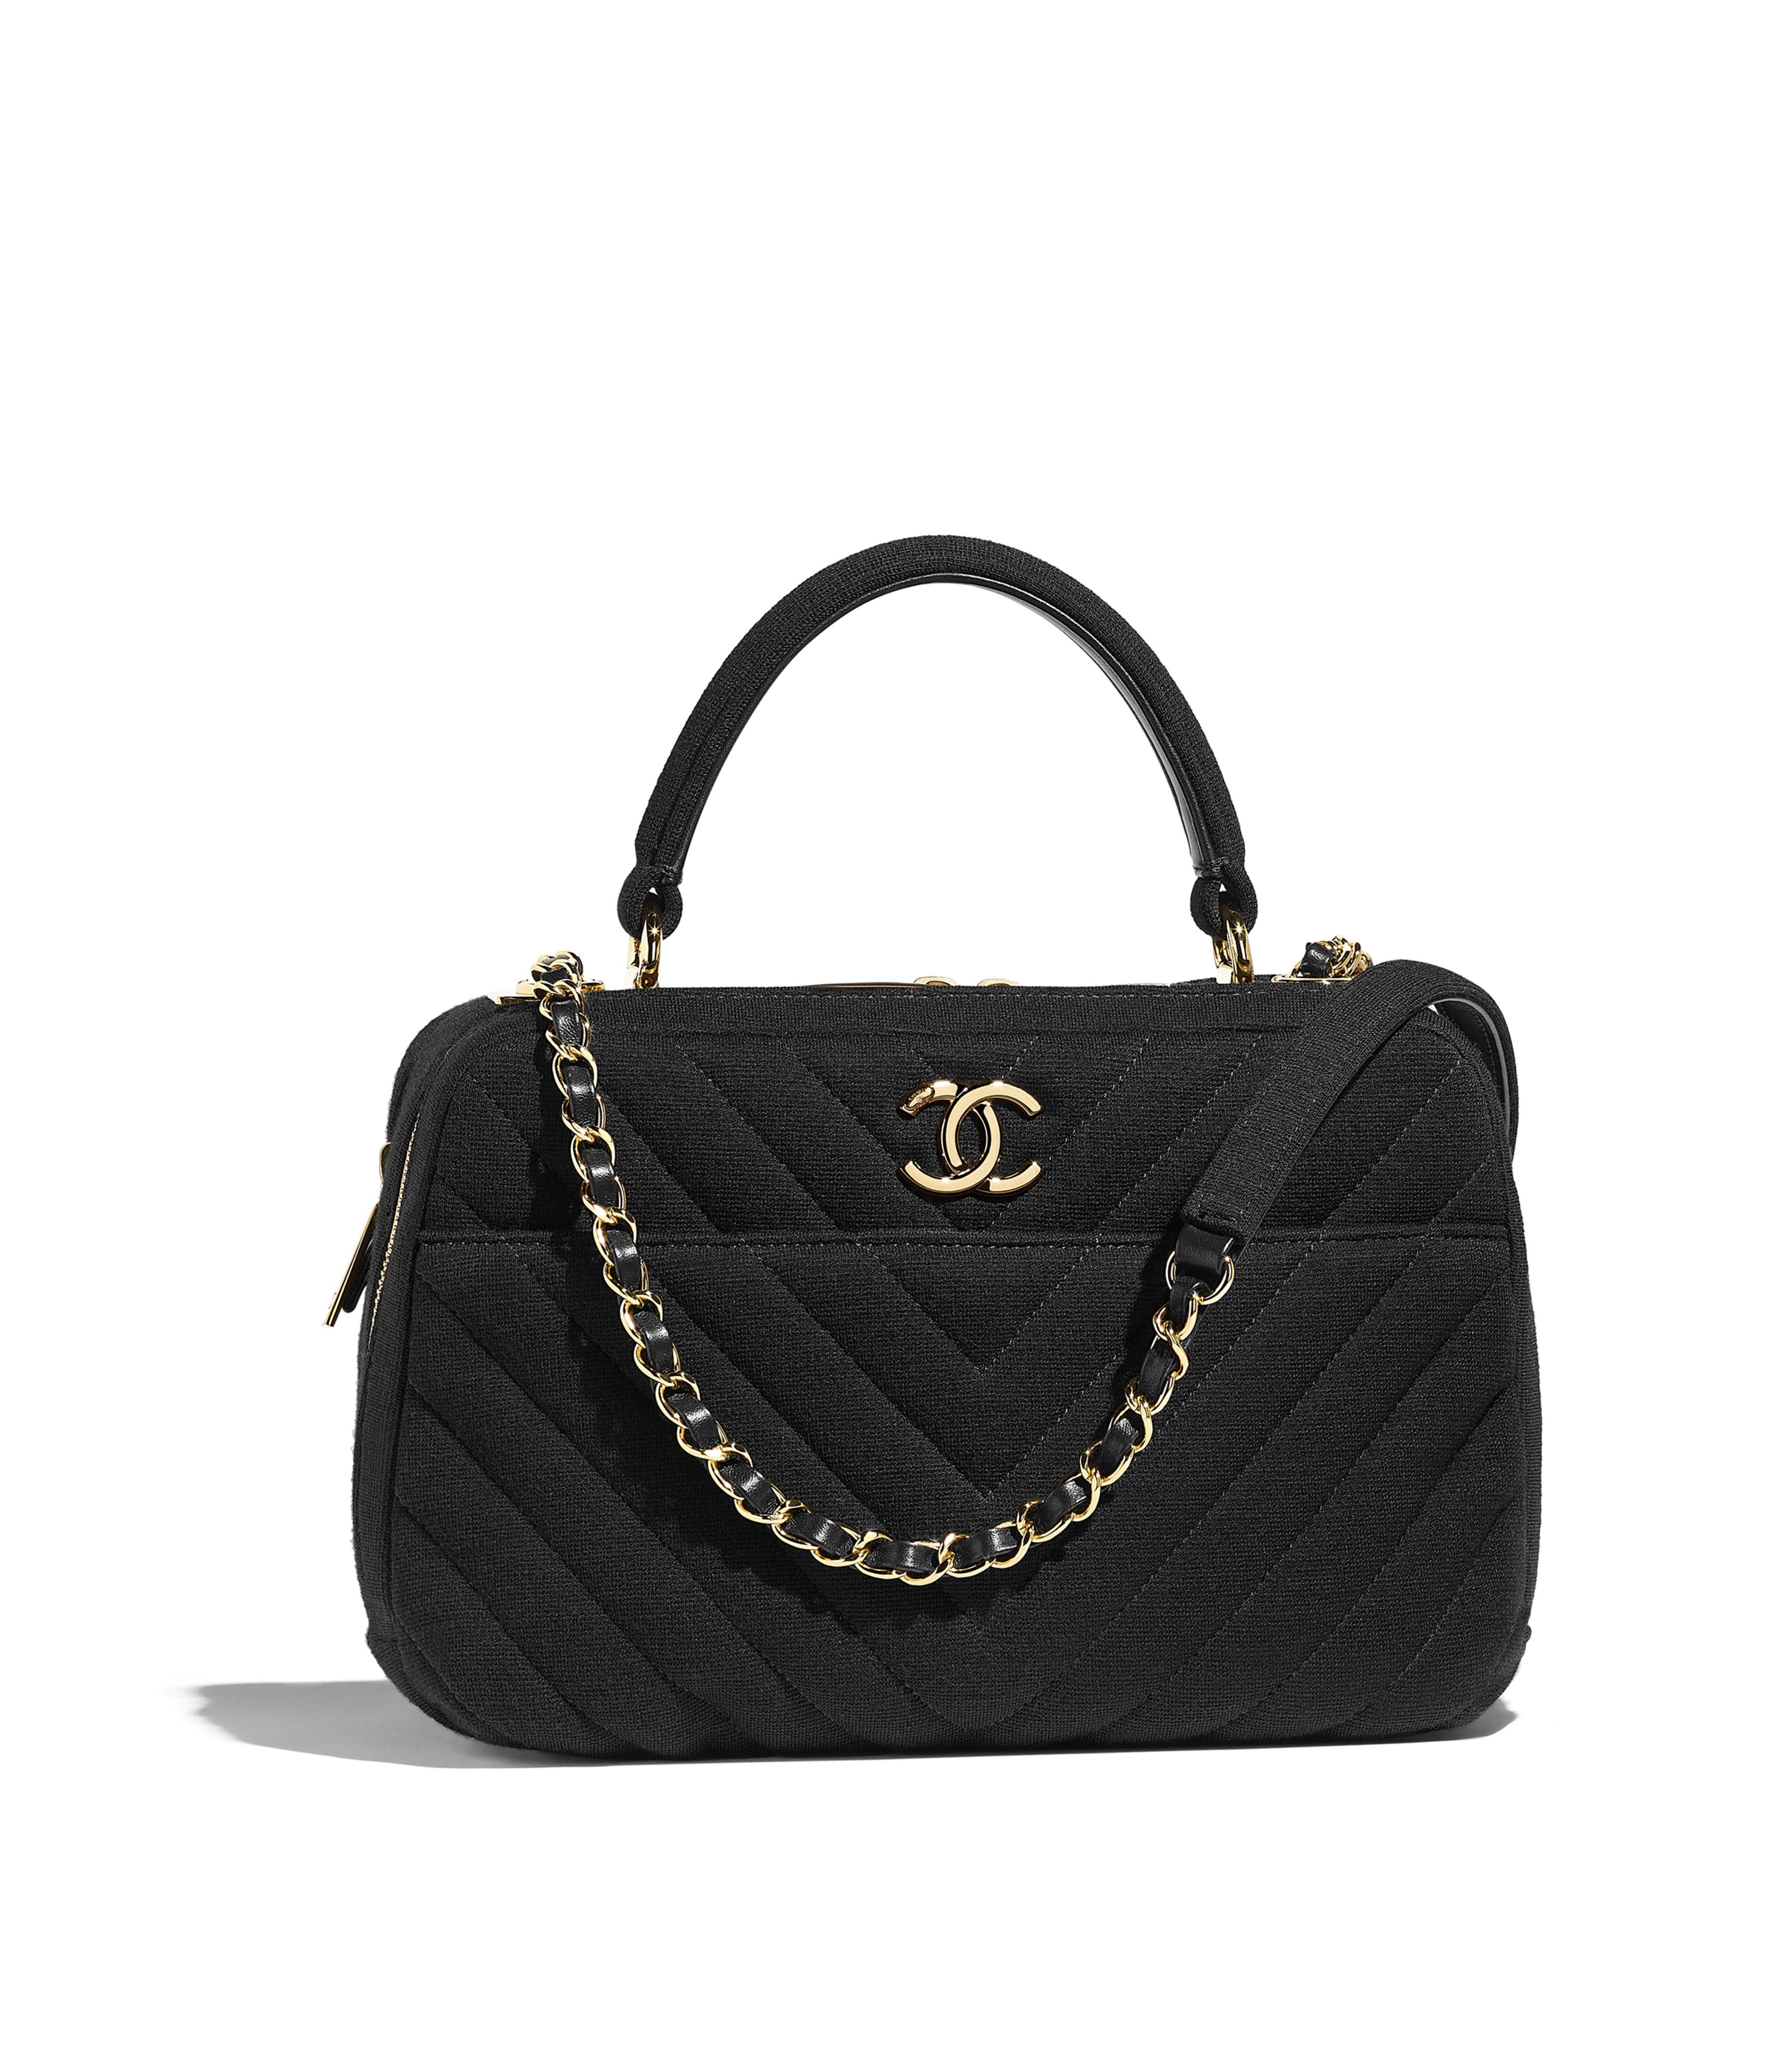 Bowling Bag Jersey Gold Tone Metal Black Ref A92238y8417994305